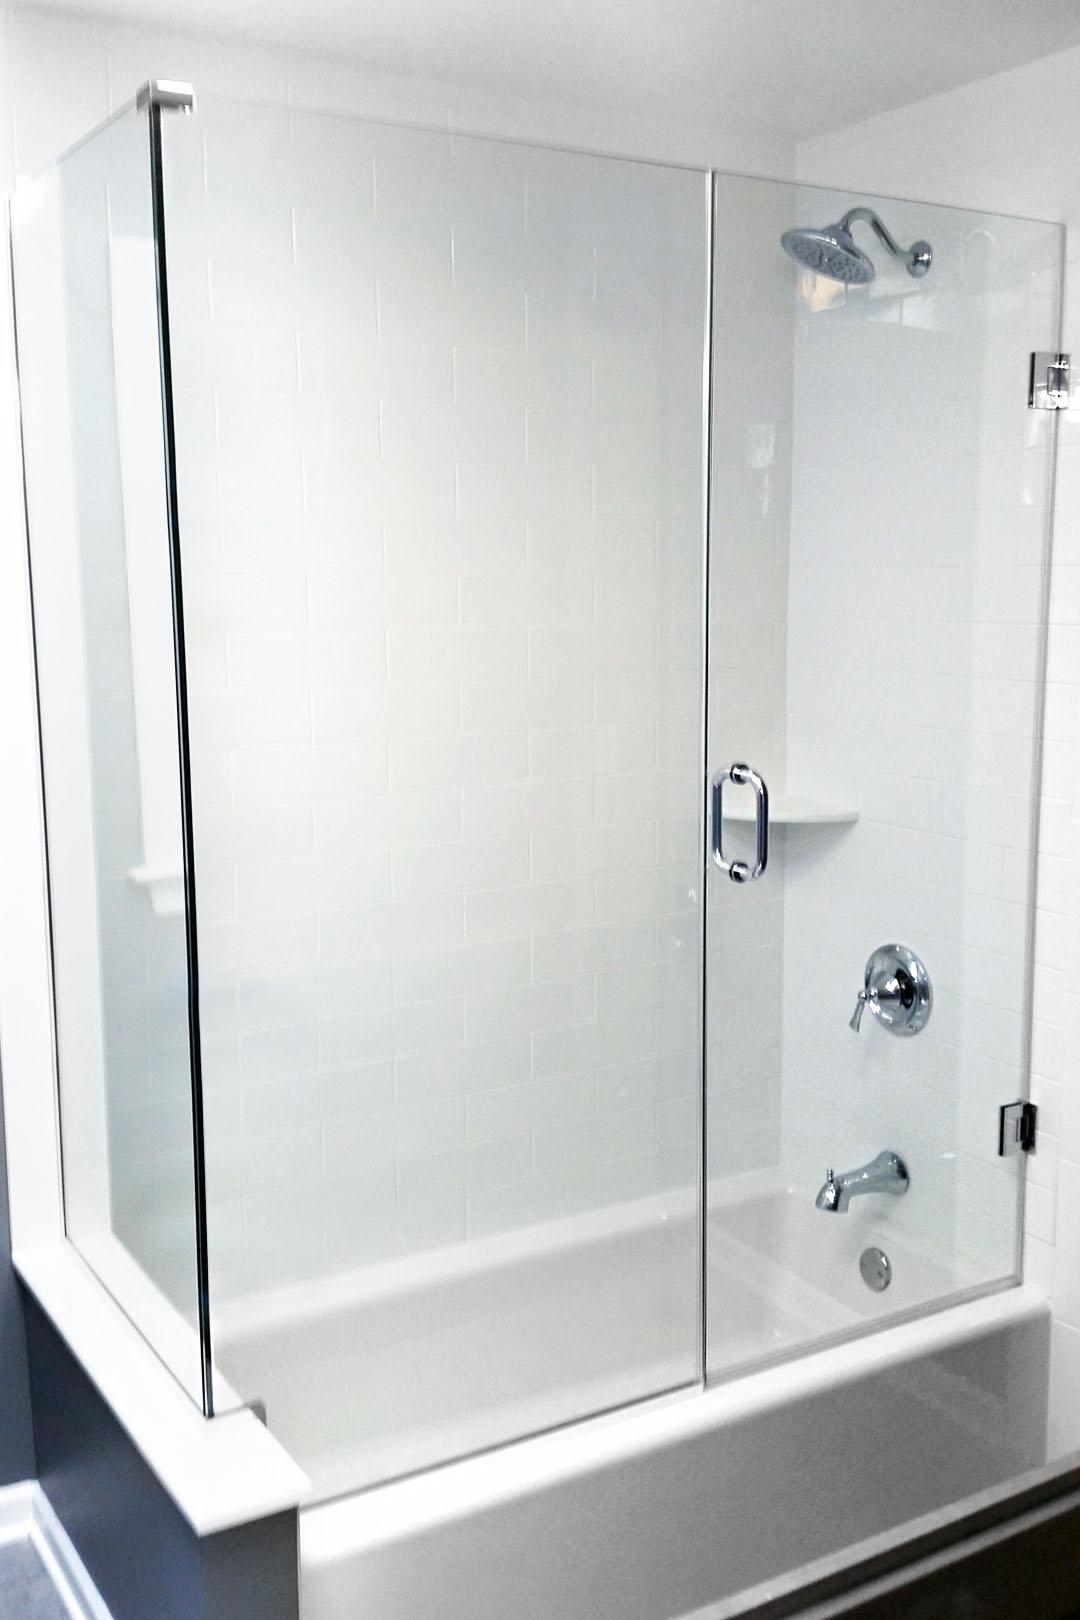 Katarinas glass shower doors portfolio custom shower door company planetlyrics Choice Image